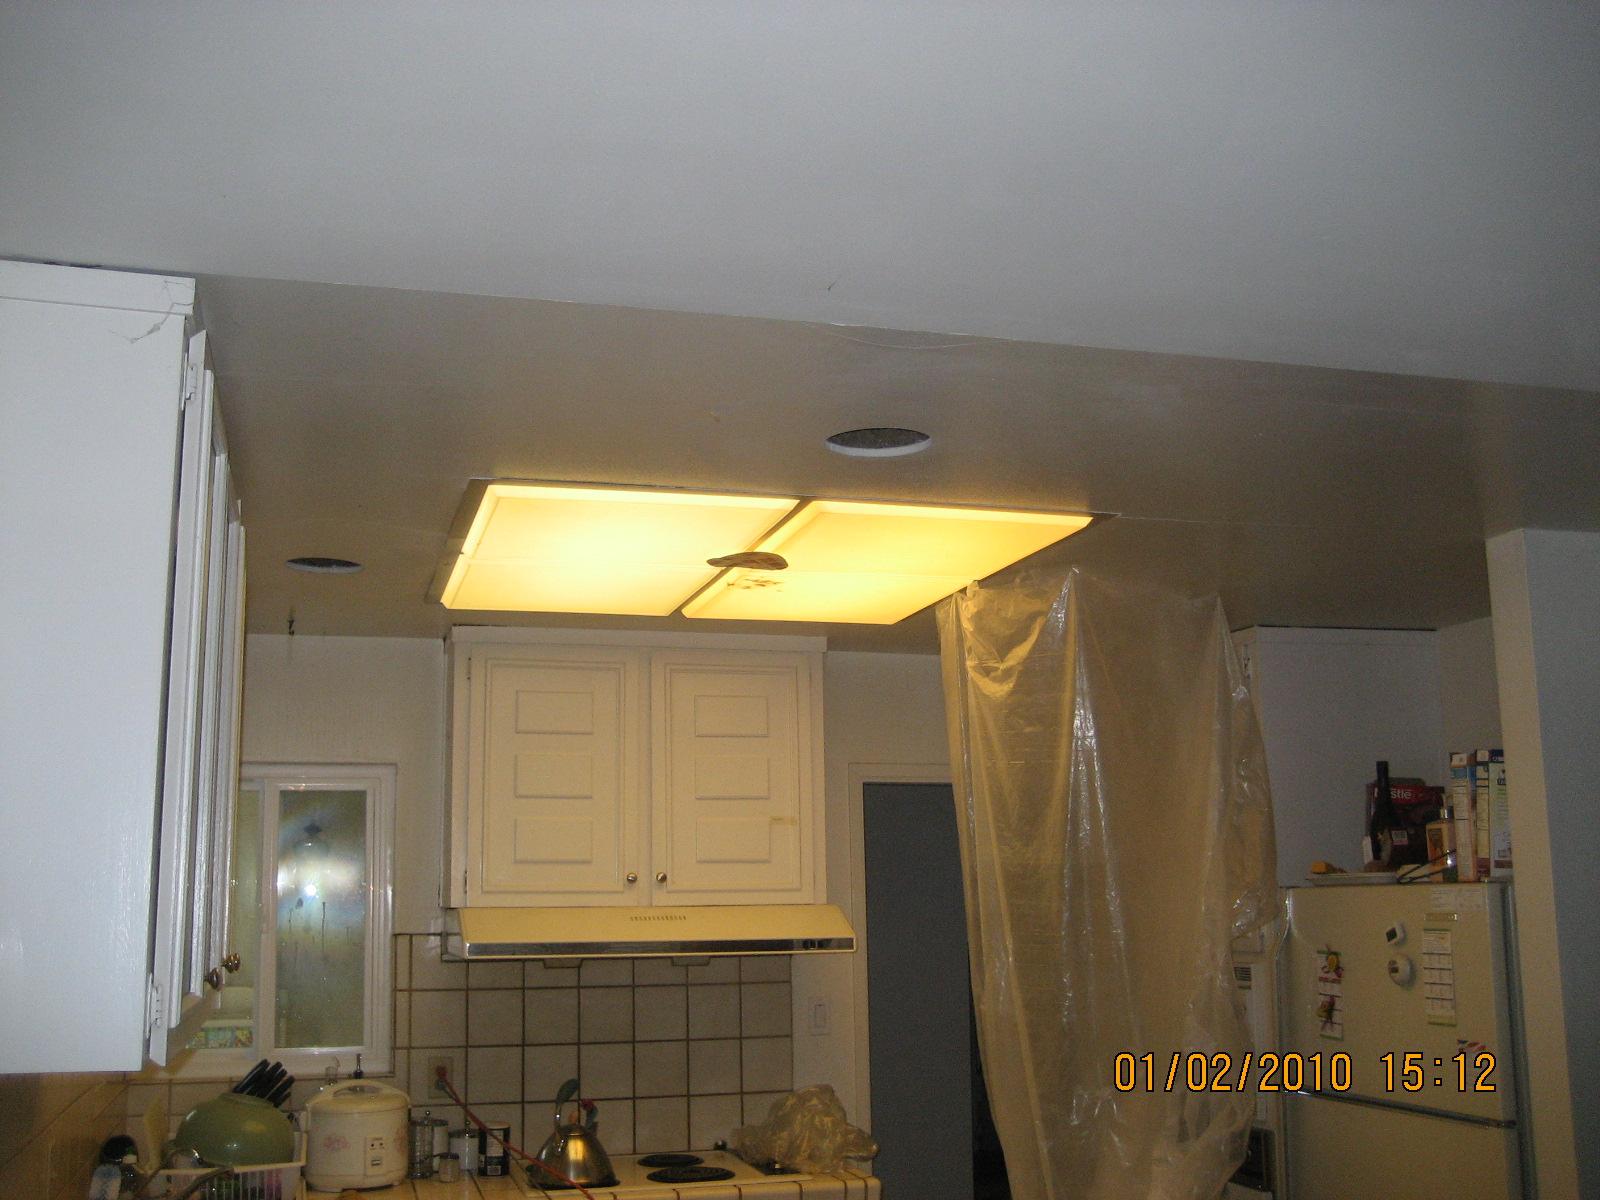 diynovice blogspot kitchen fluorescent light covers DIY Kitchen Remodeling Part II Construction